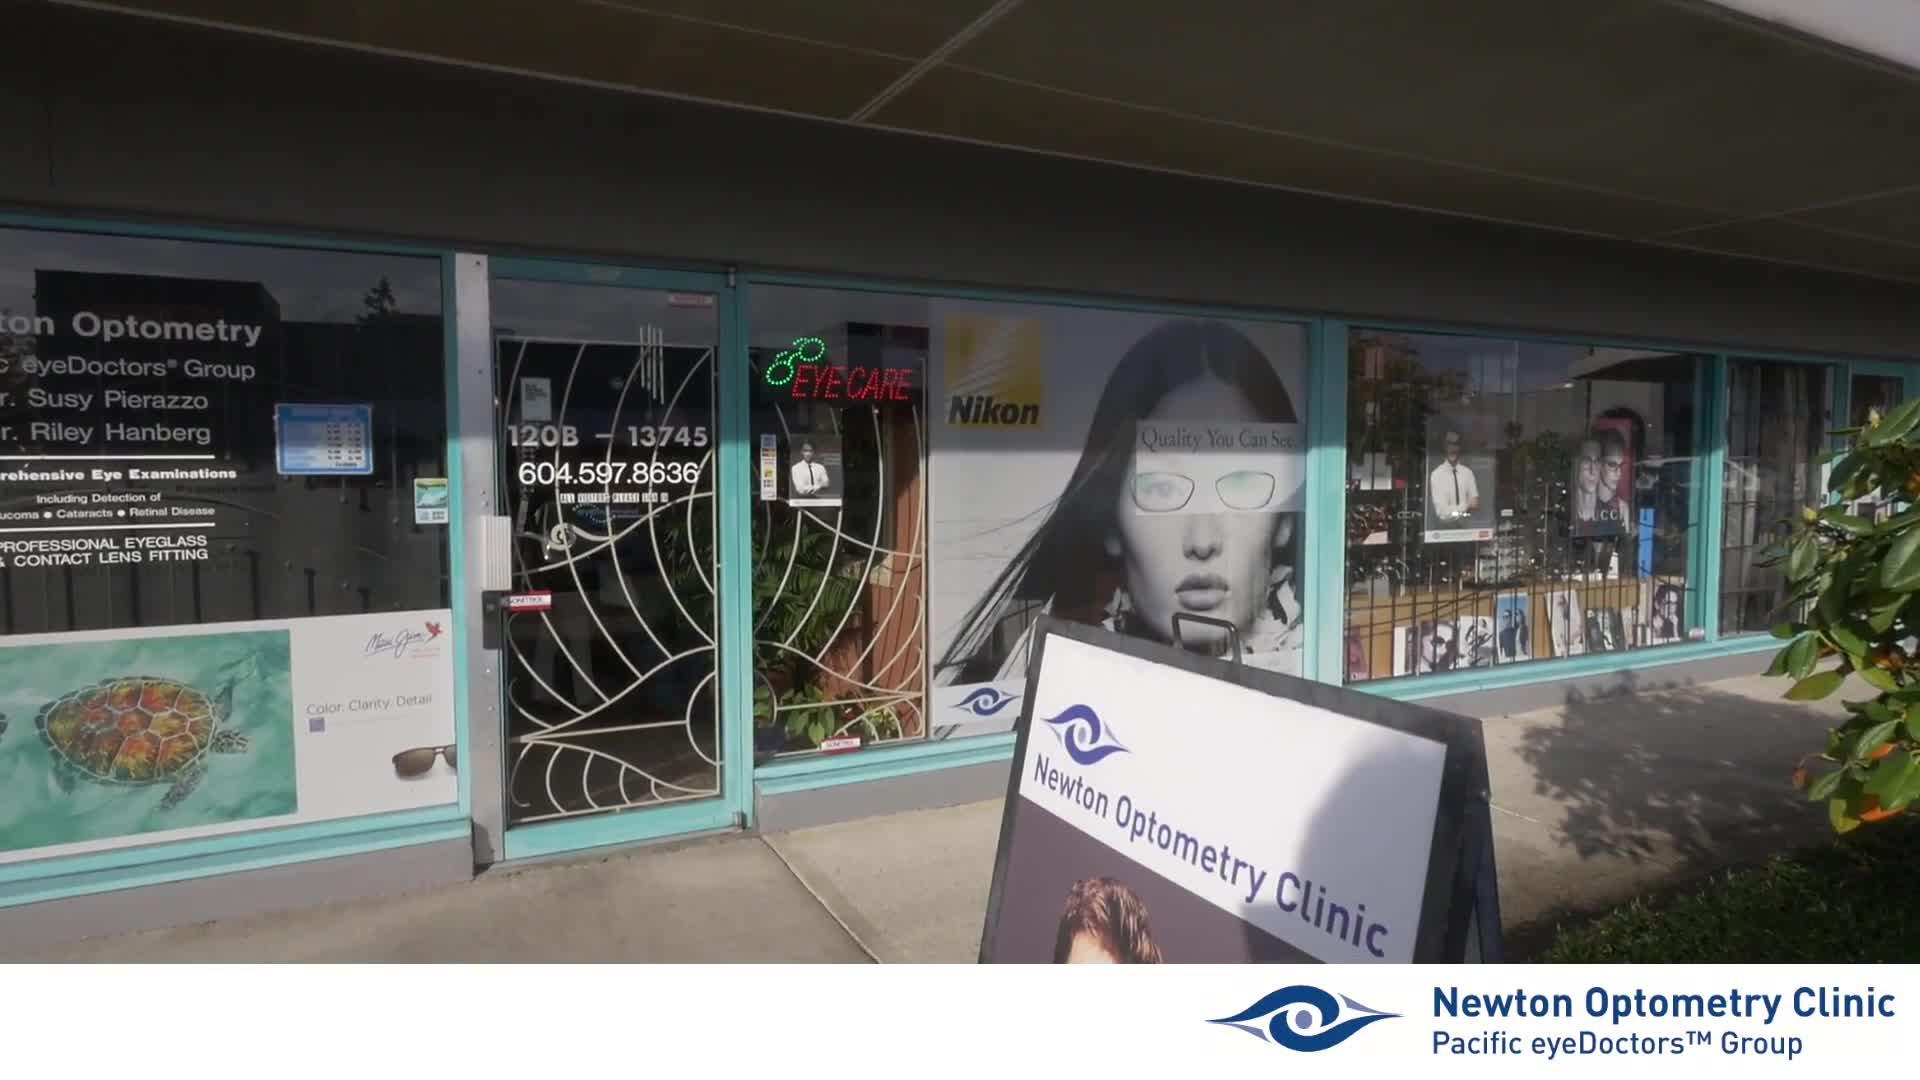 Newton Optometry Clinic - Optometrists - 604-597-8636